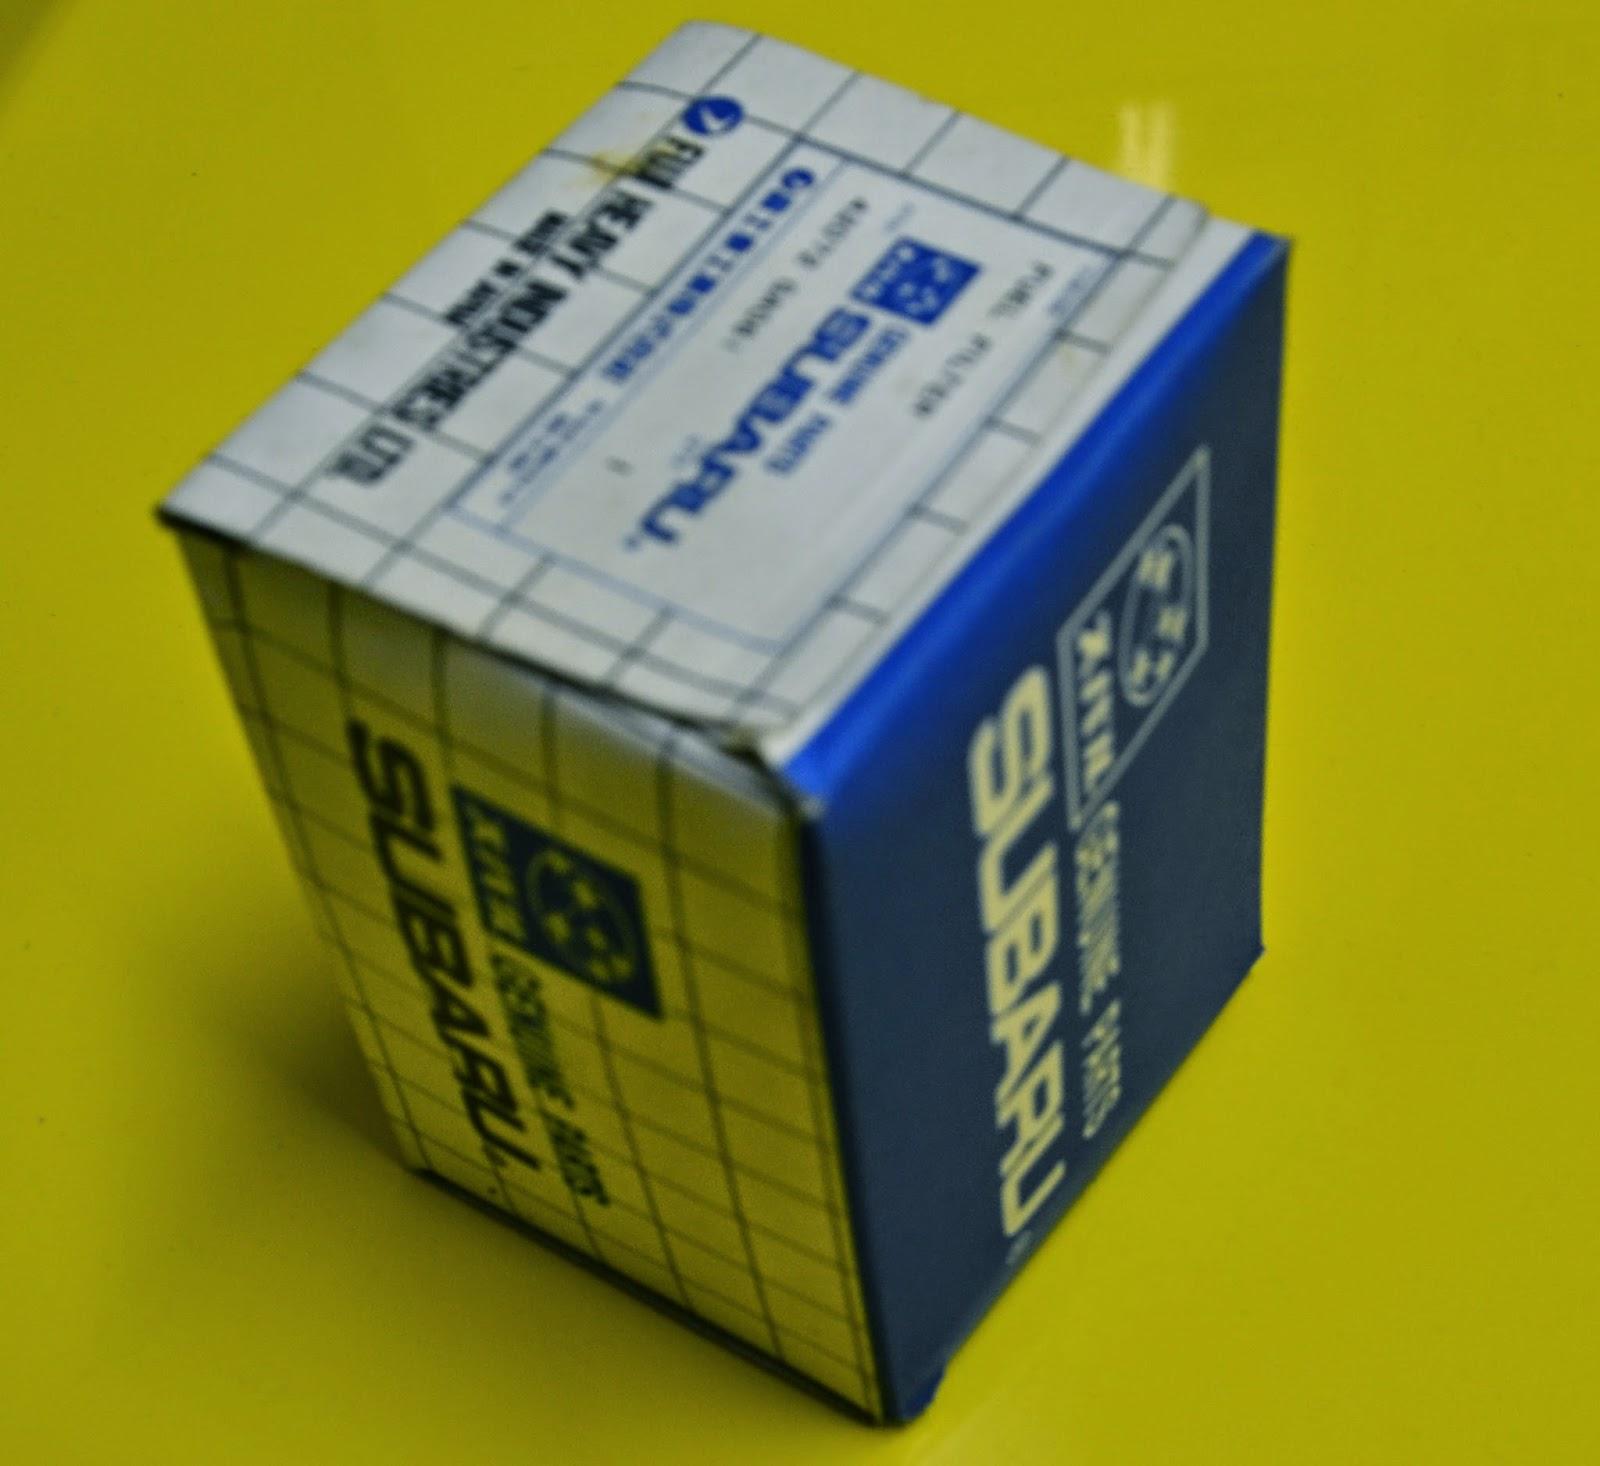 honda civic 96 00 hb tailgate dampers showa price 20  [ 1600 x 1466 Pixel ]